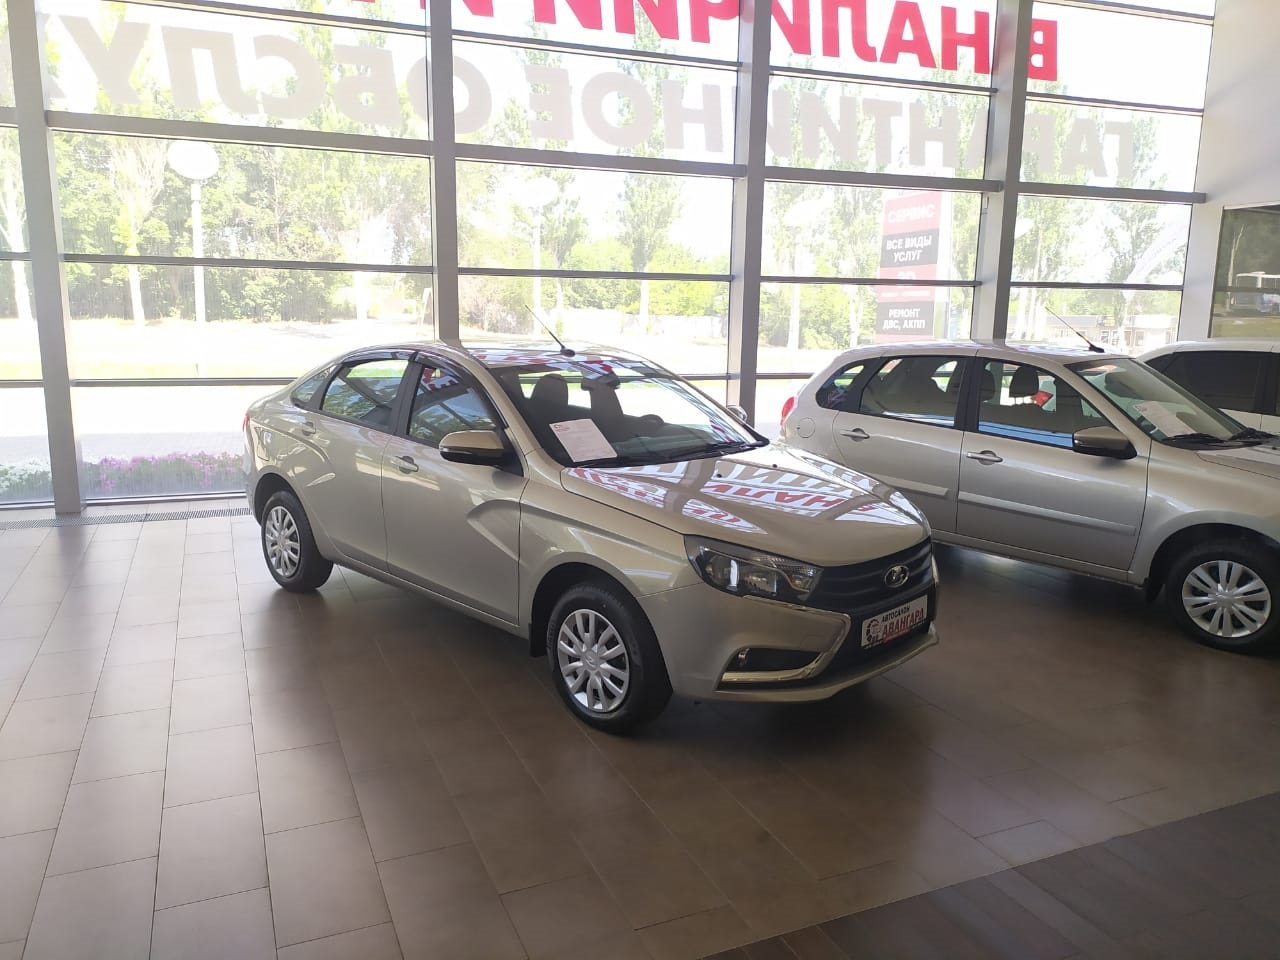 Lada Vesta (Лада Веста) седан 1.6 л 16-кл. (106 л.с.), 5МТ Comfort / Multimedia 2020